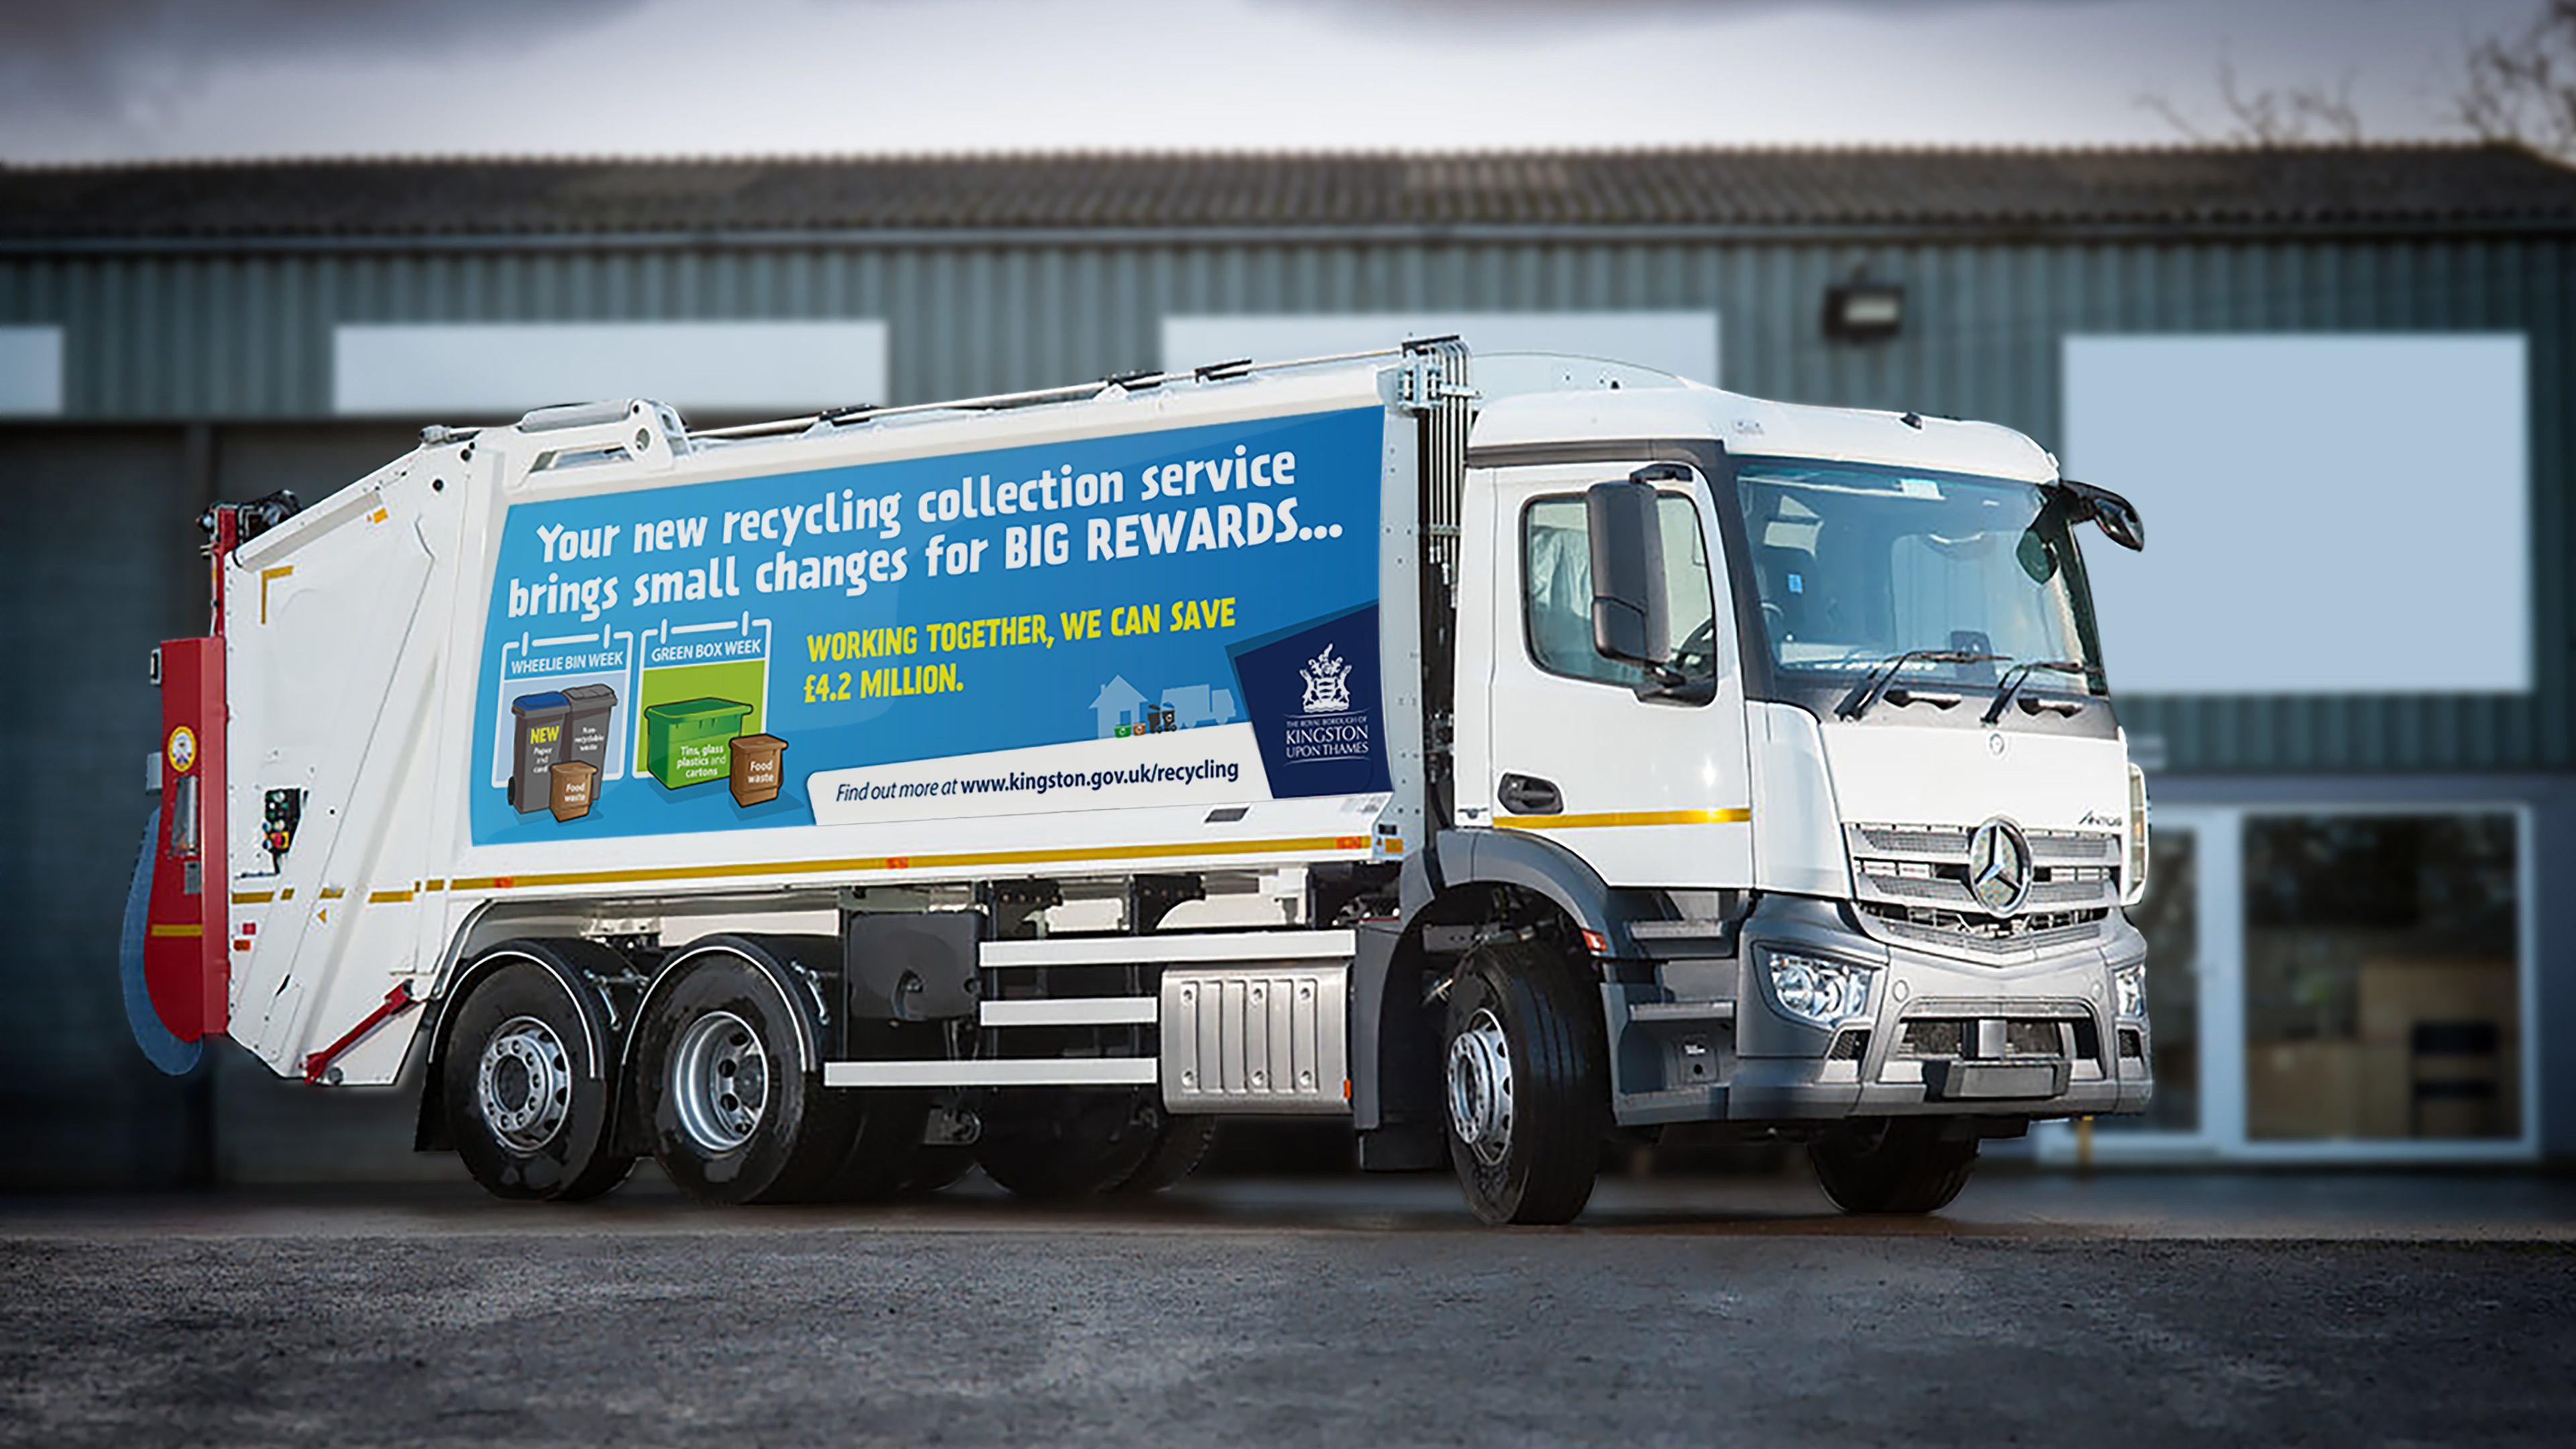 RBK_waste_truck.jpg